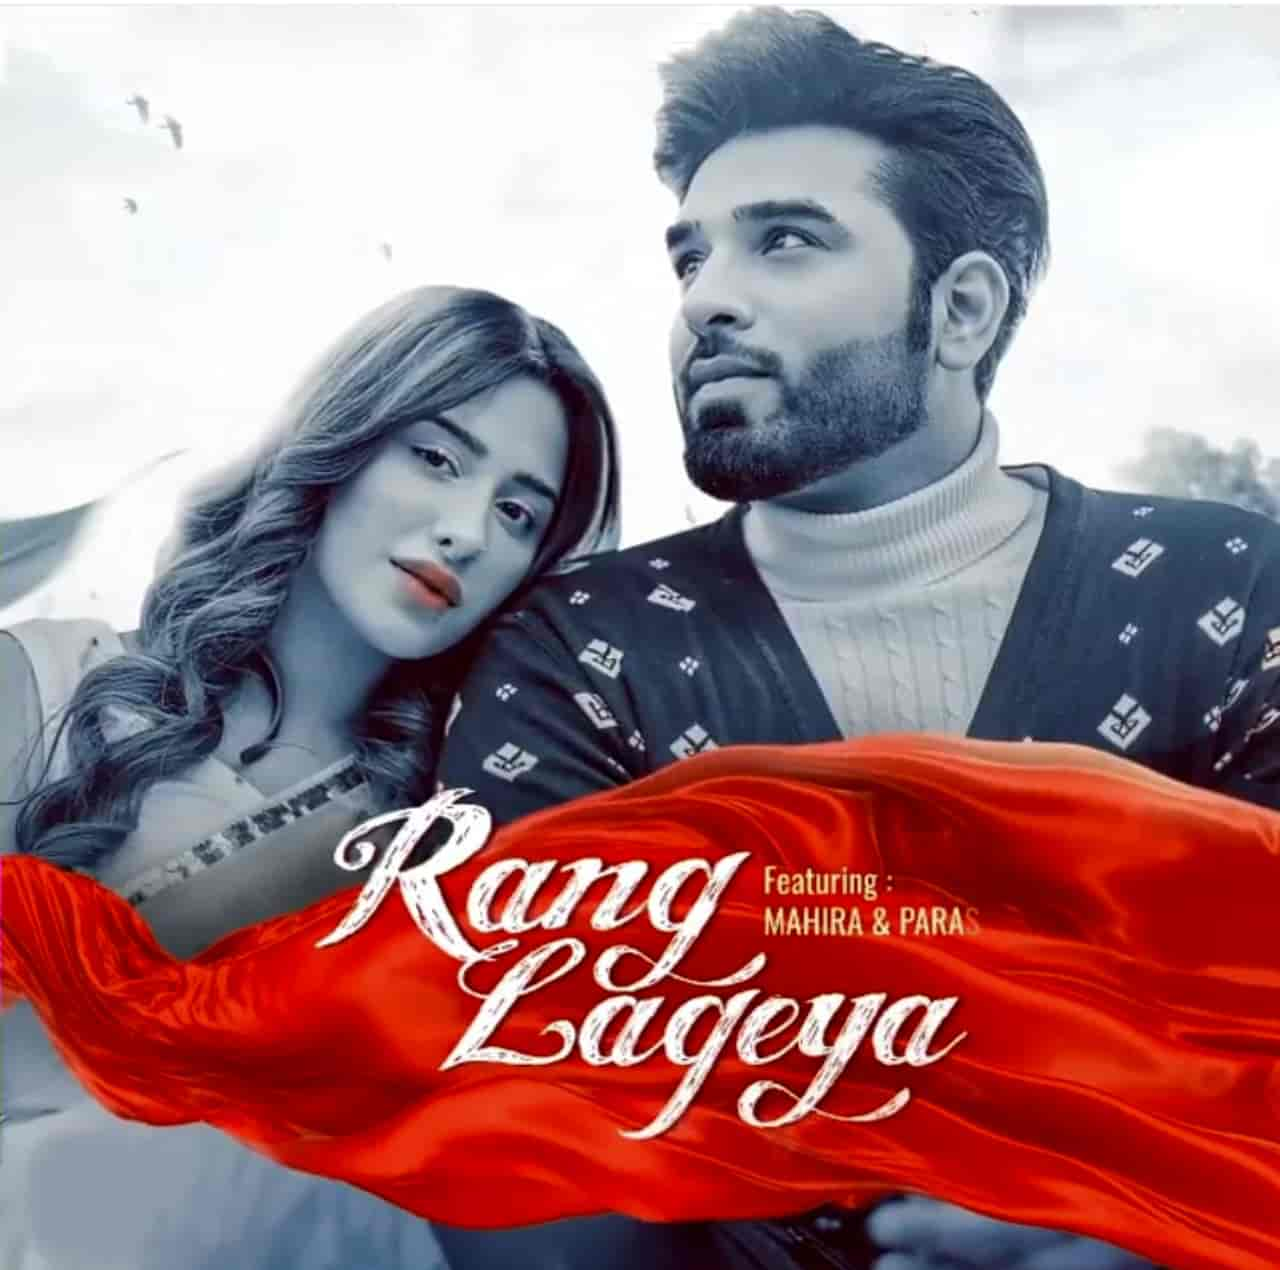 Rang Lageya Punjabi Song Lyrics Mahira Sharma